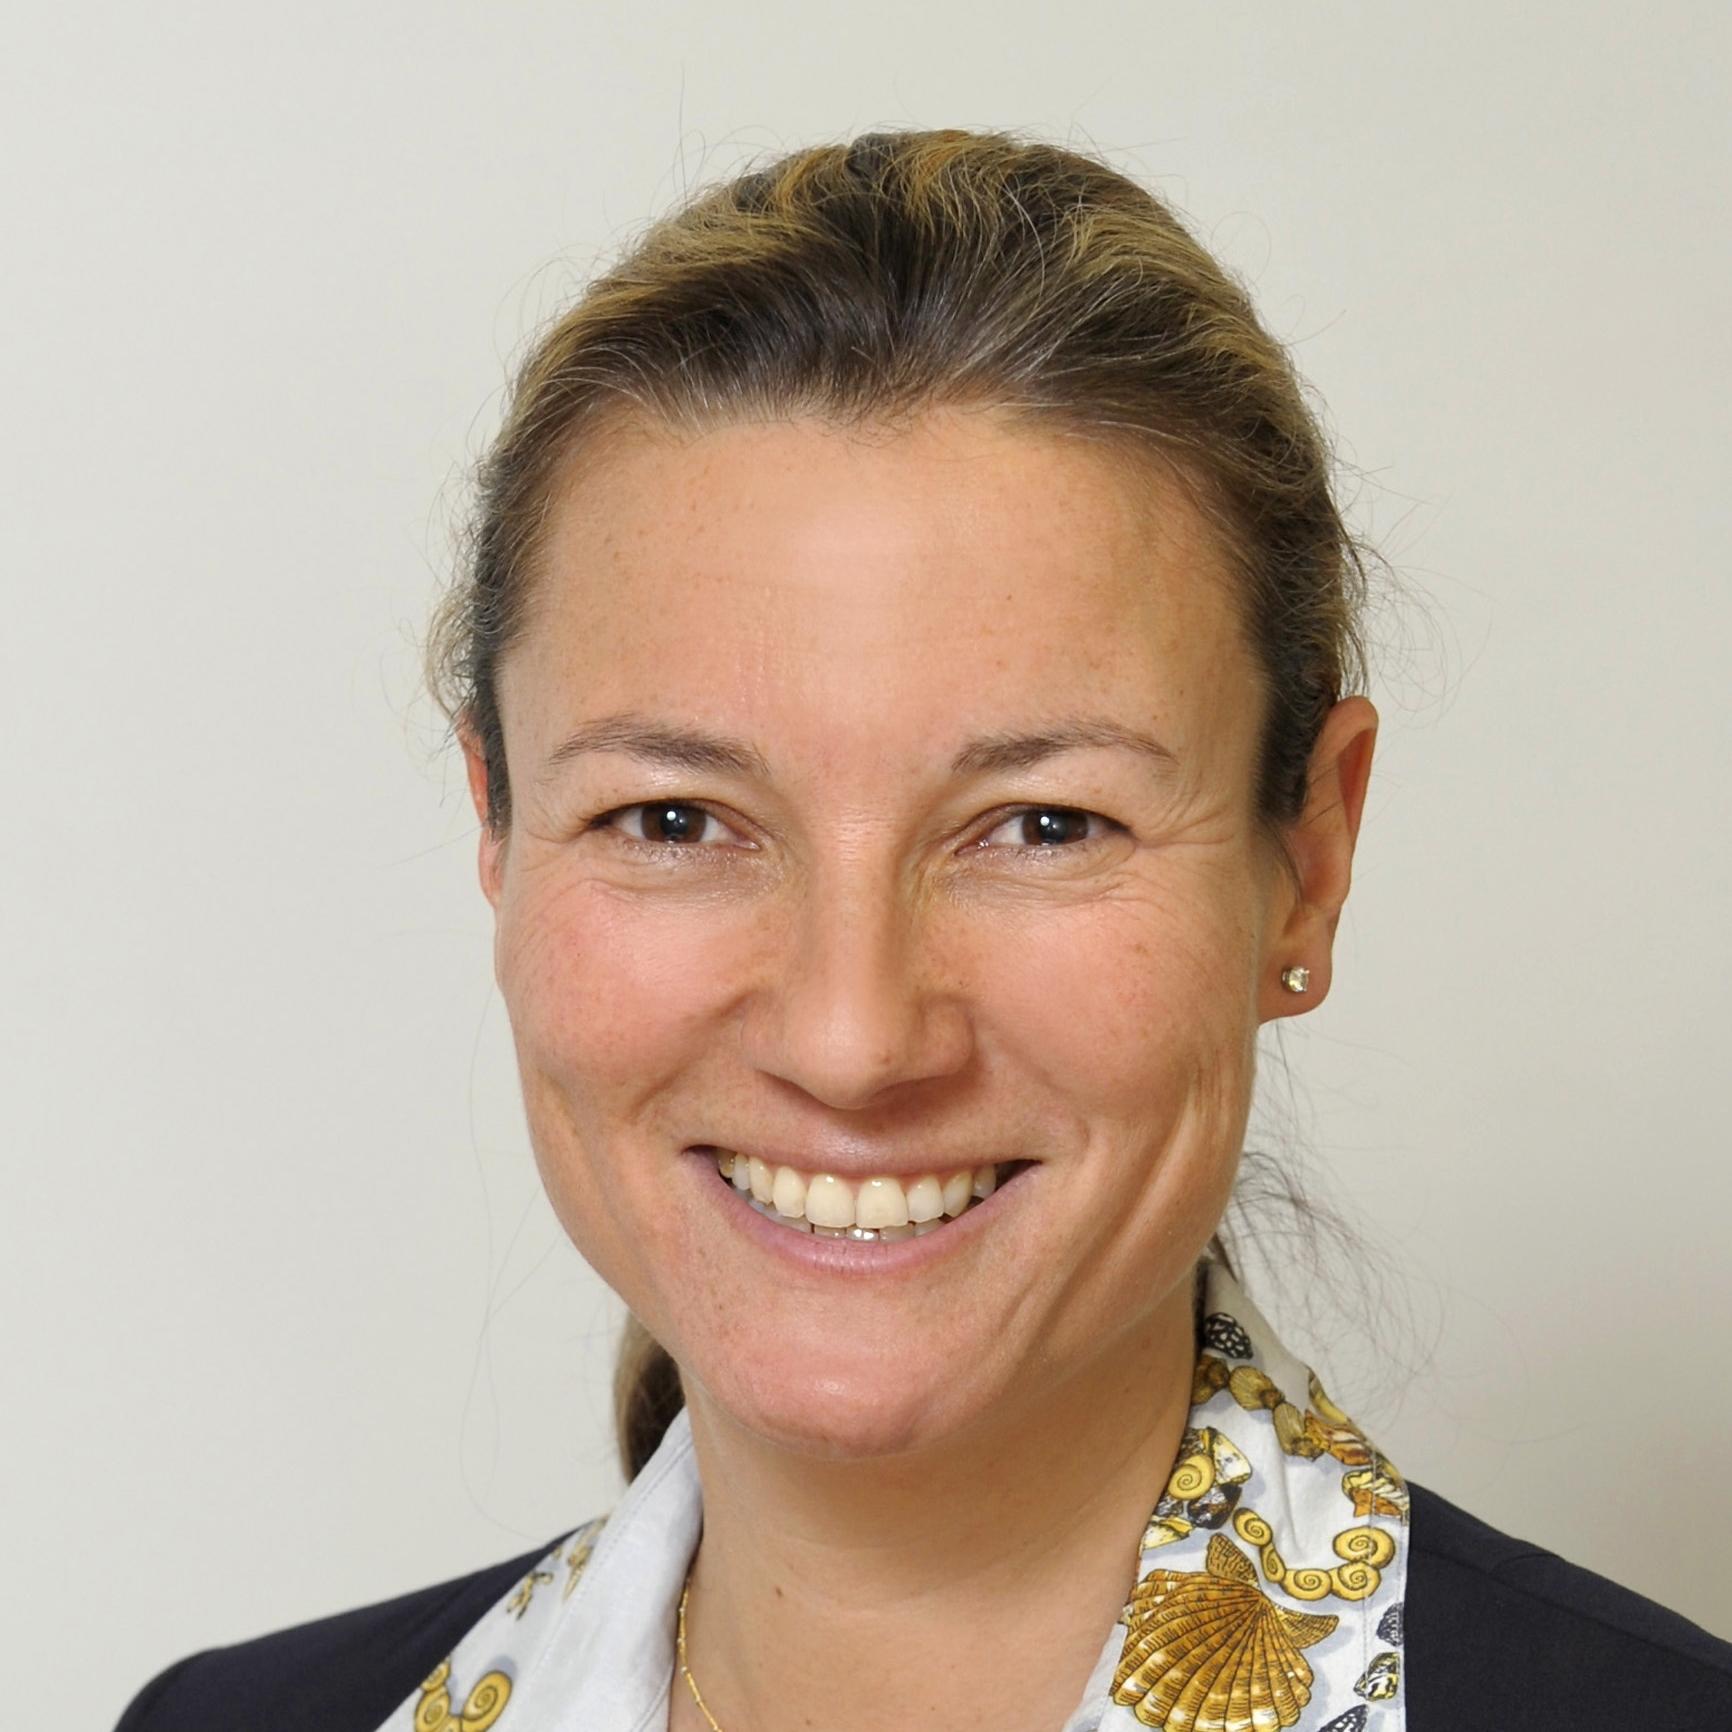 Sara Murray OBE